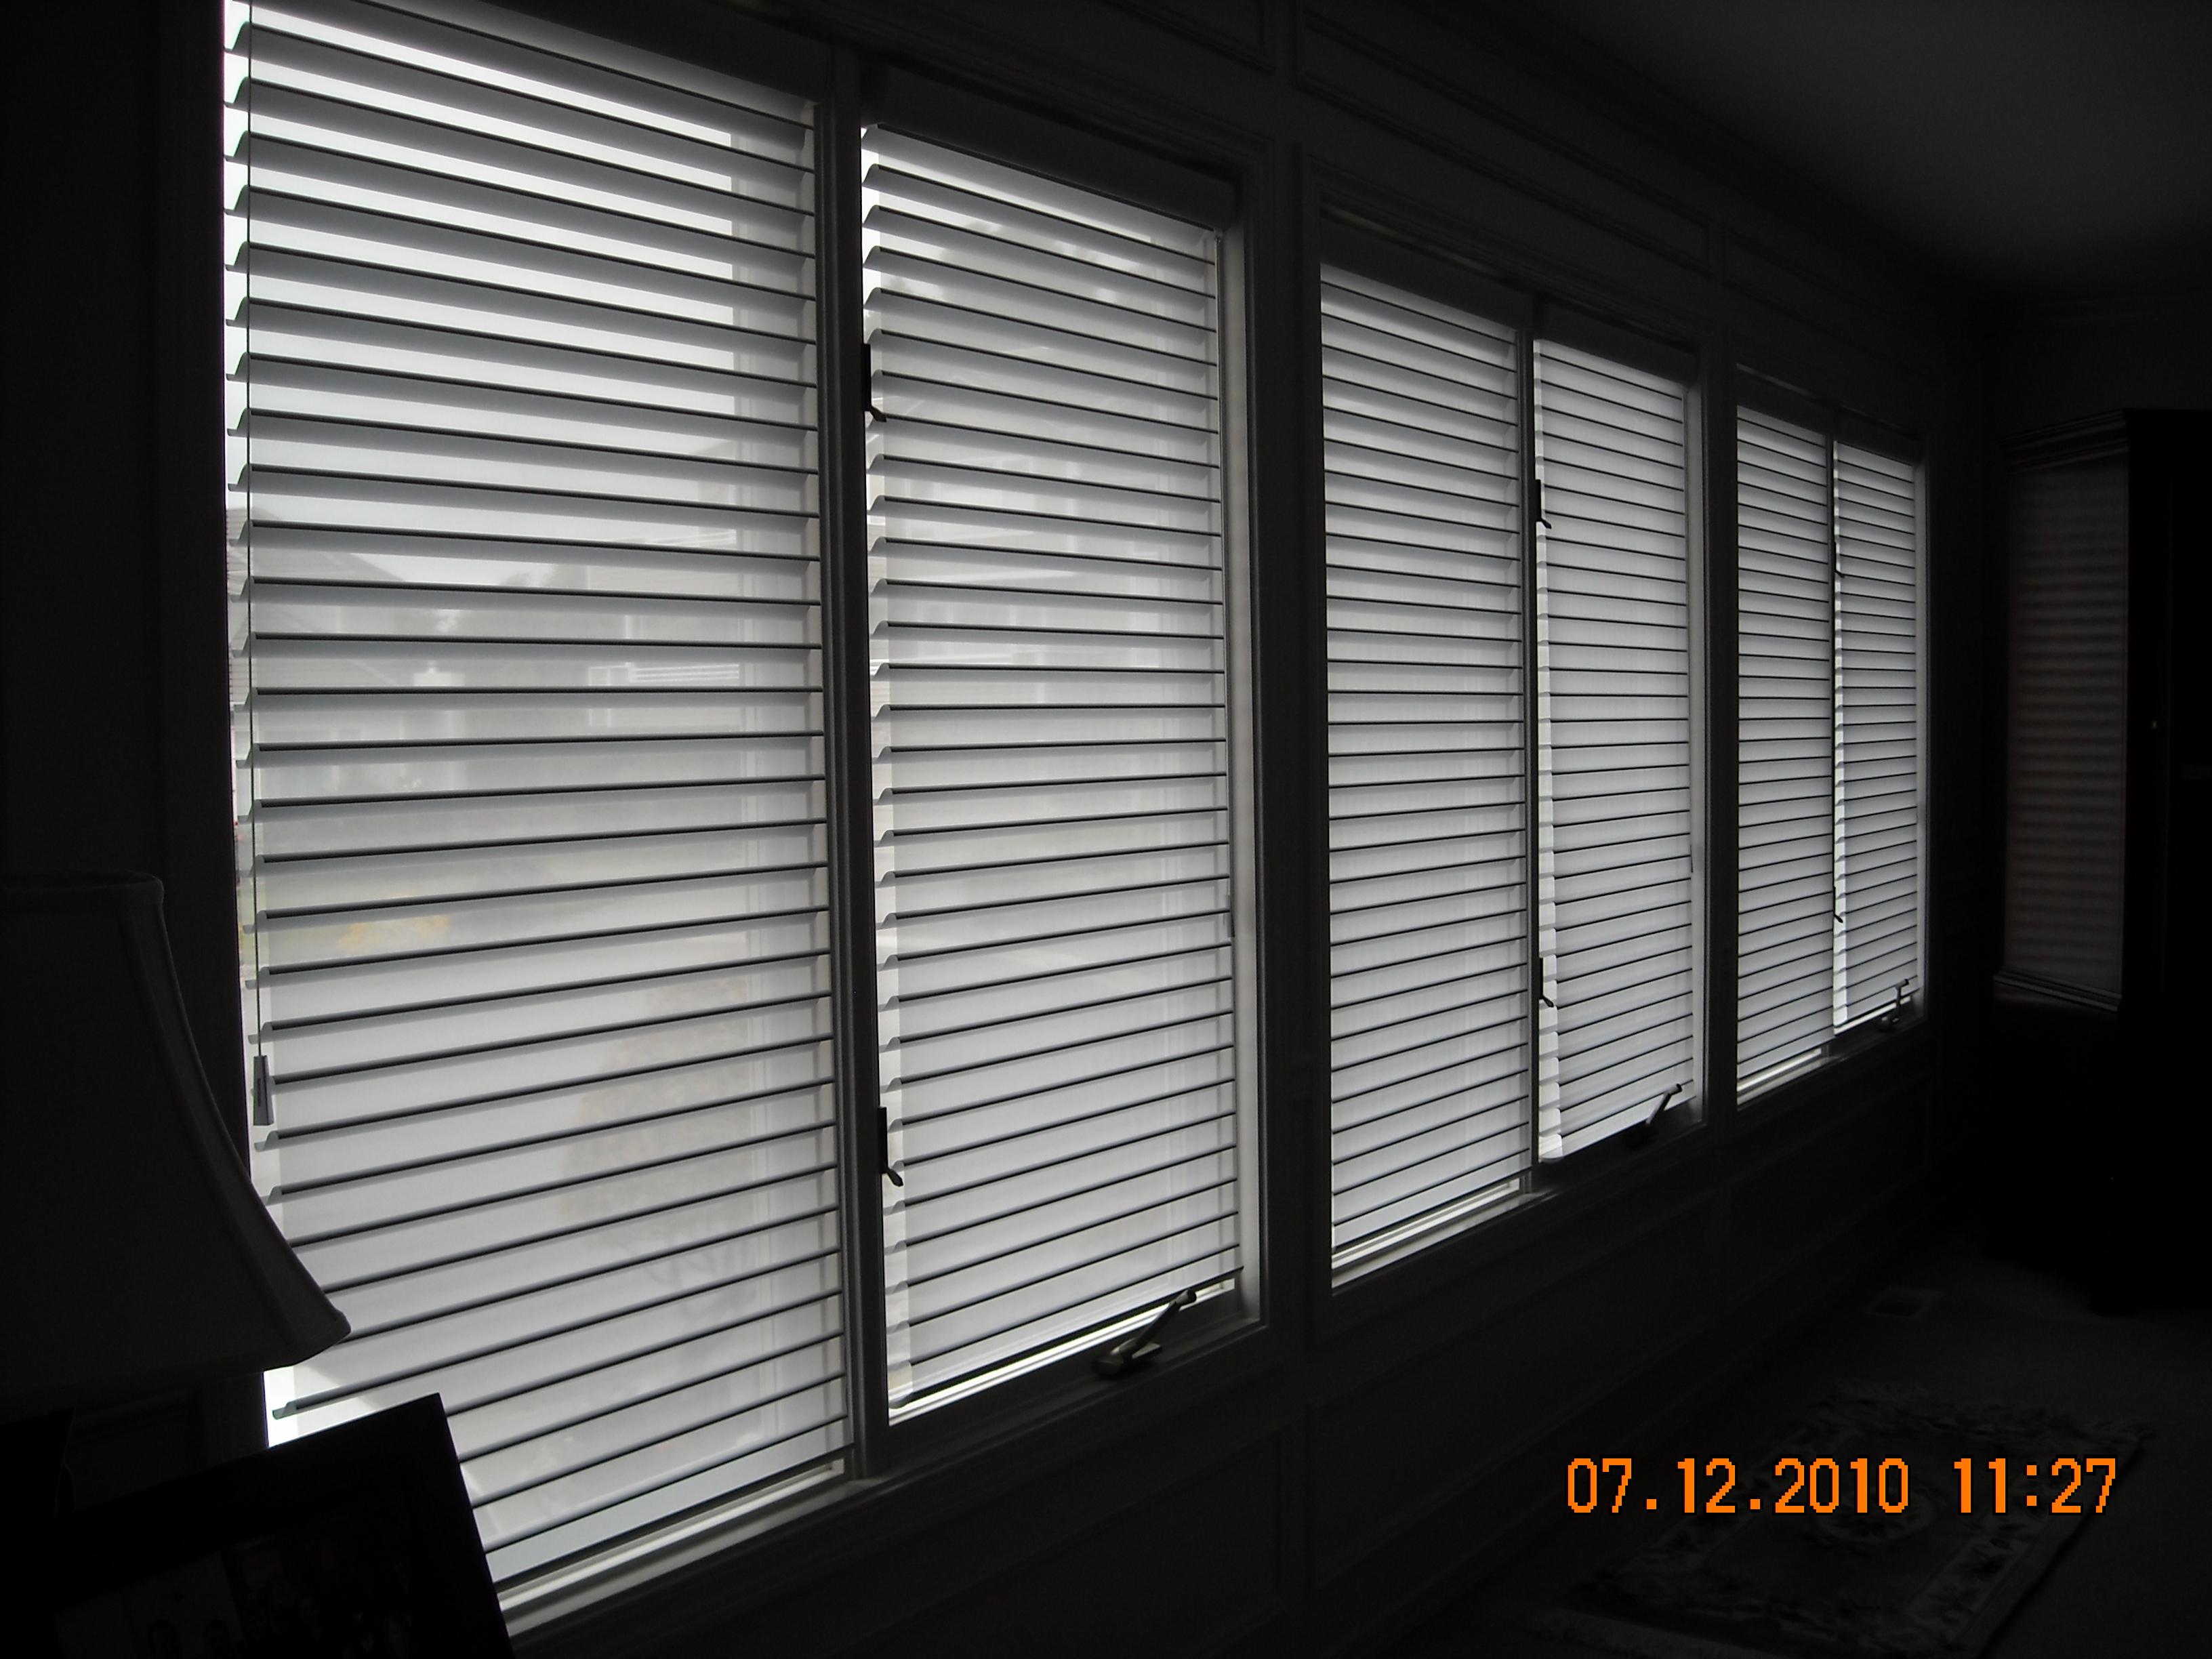 Budget Blinds Of Seattle Nw Shoreline Wa 98133 Angies